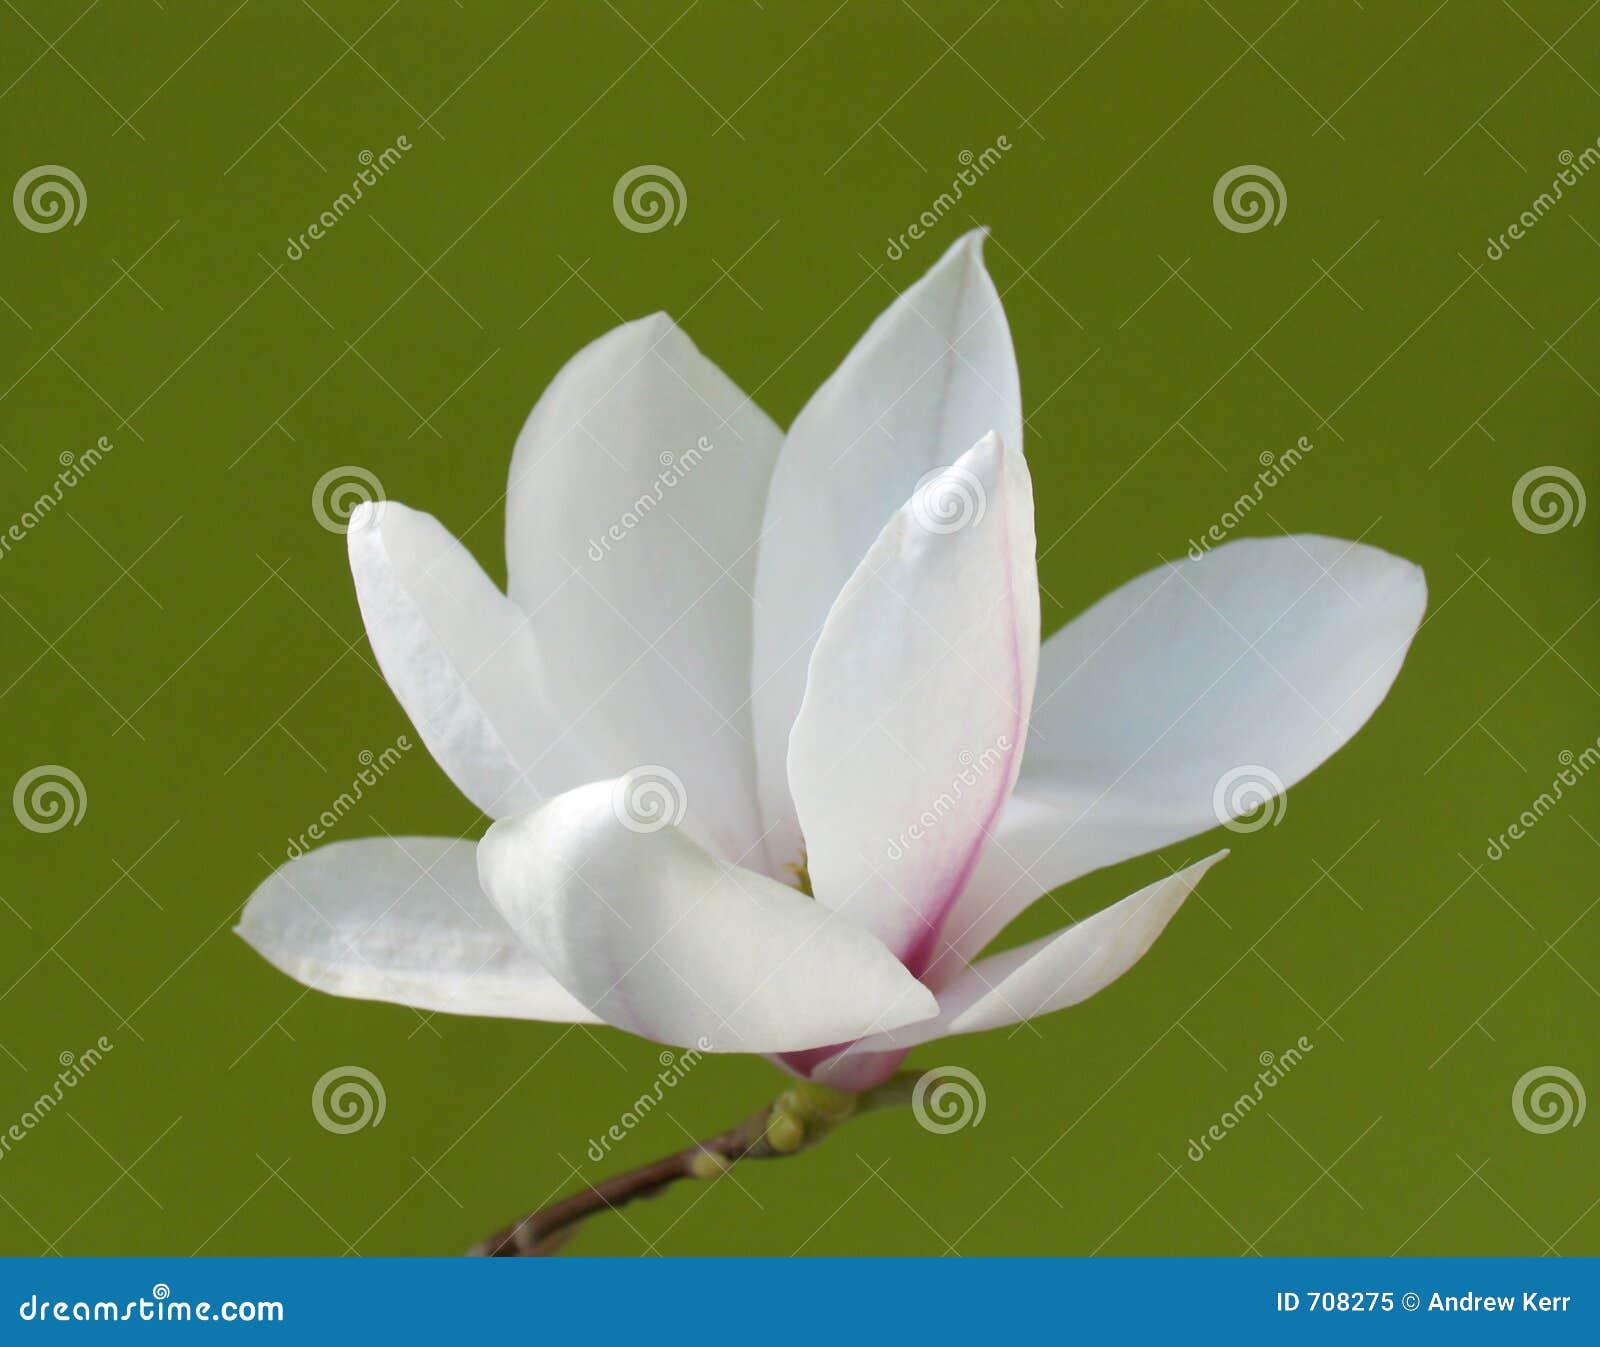 Stunning magnolia flower